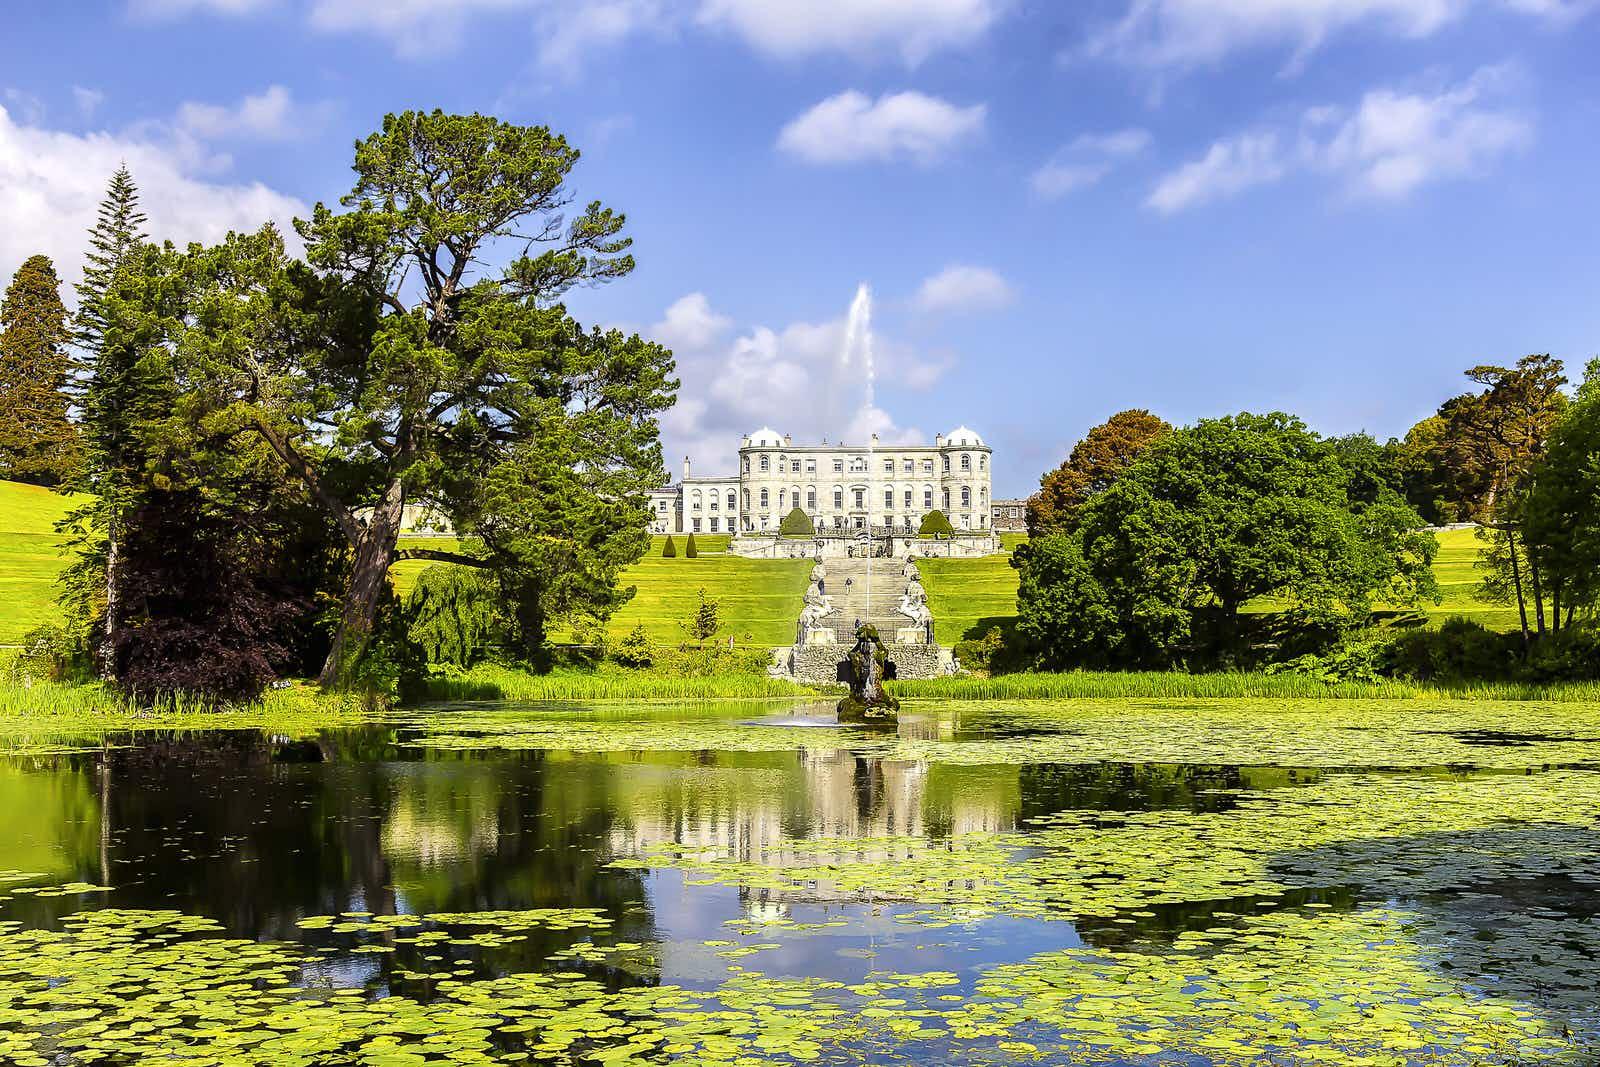 Discover magnificent Powerscourt House in Wicklow © alredosaz / Shutterstock